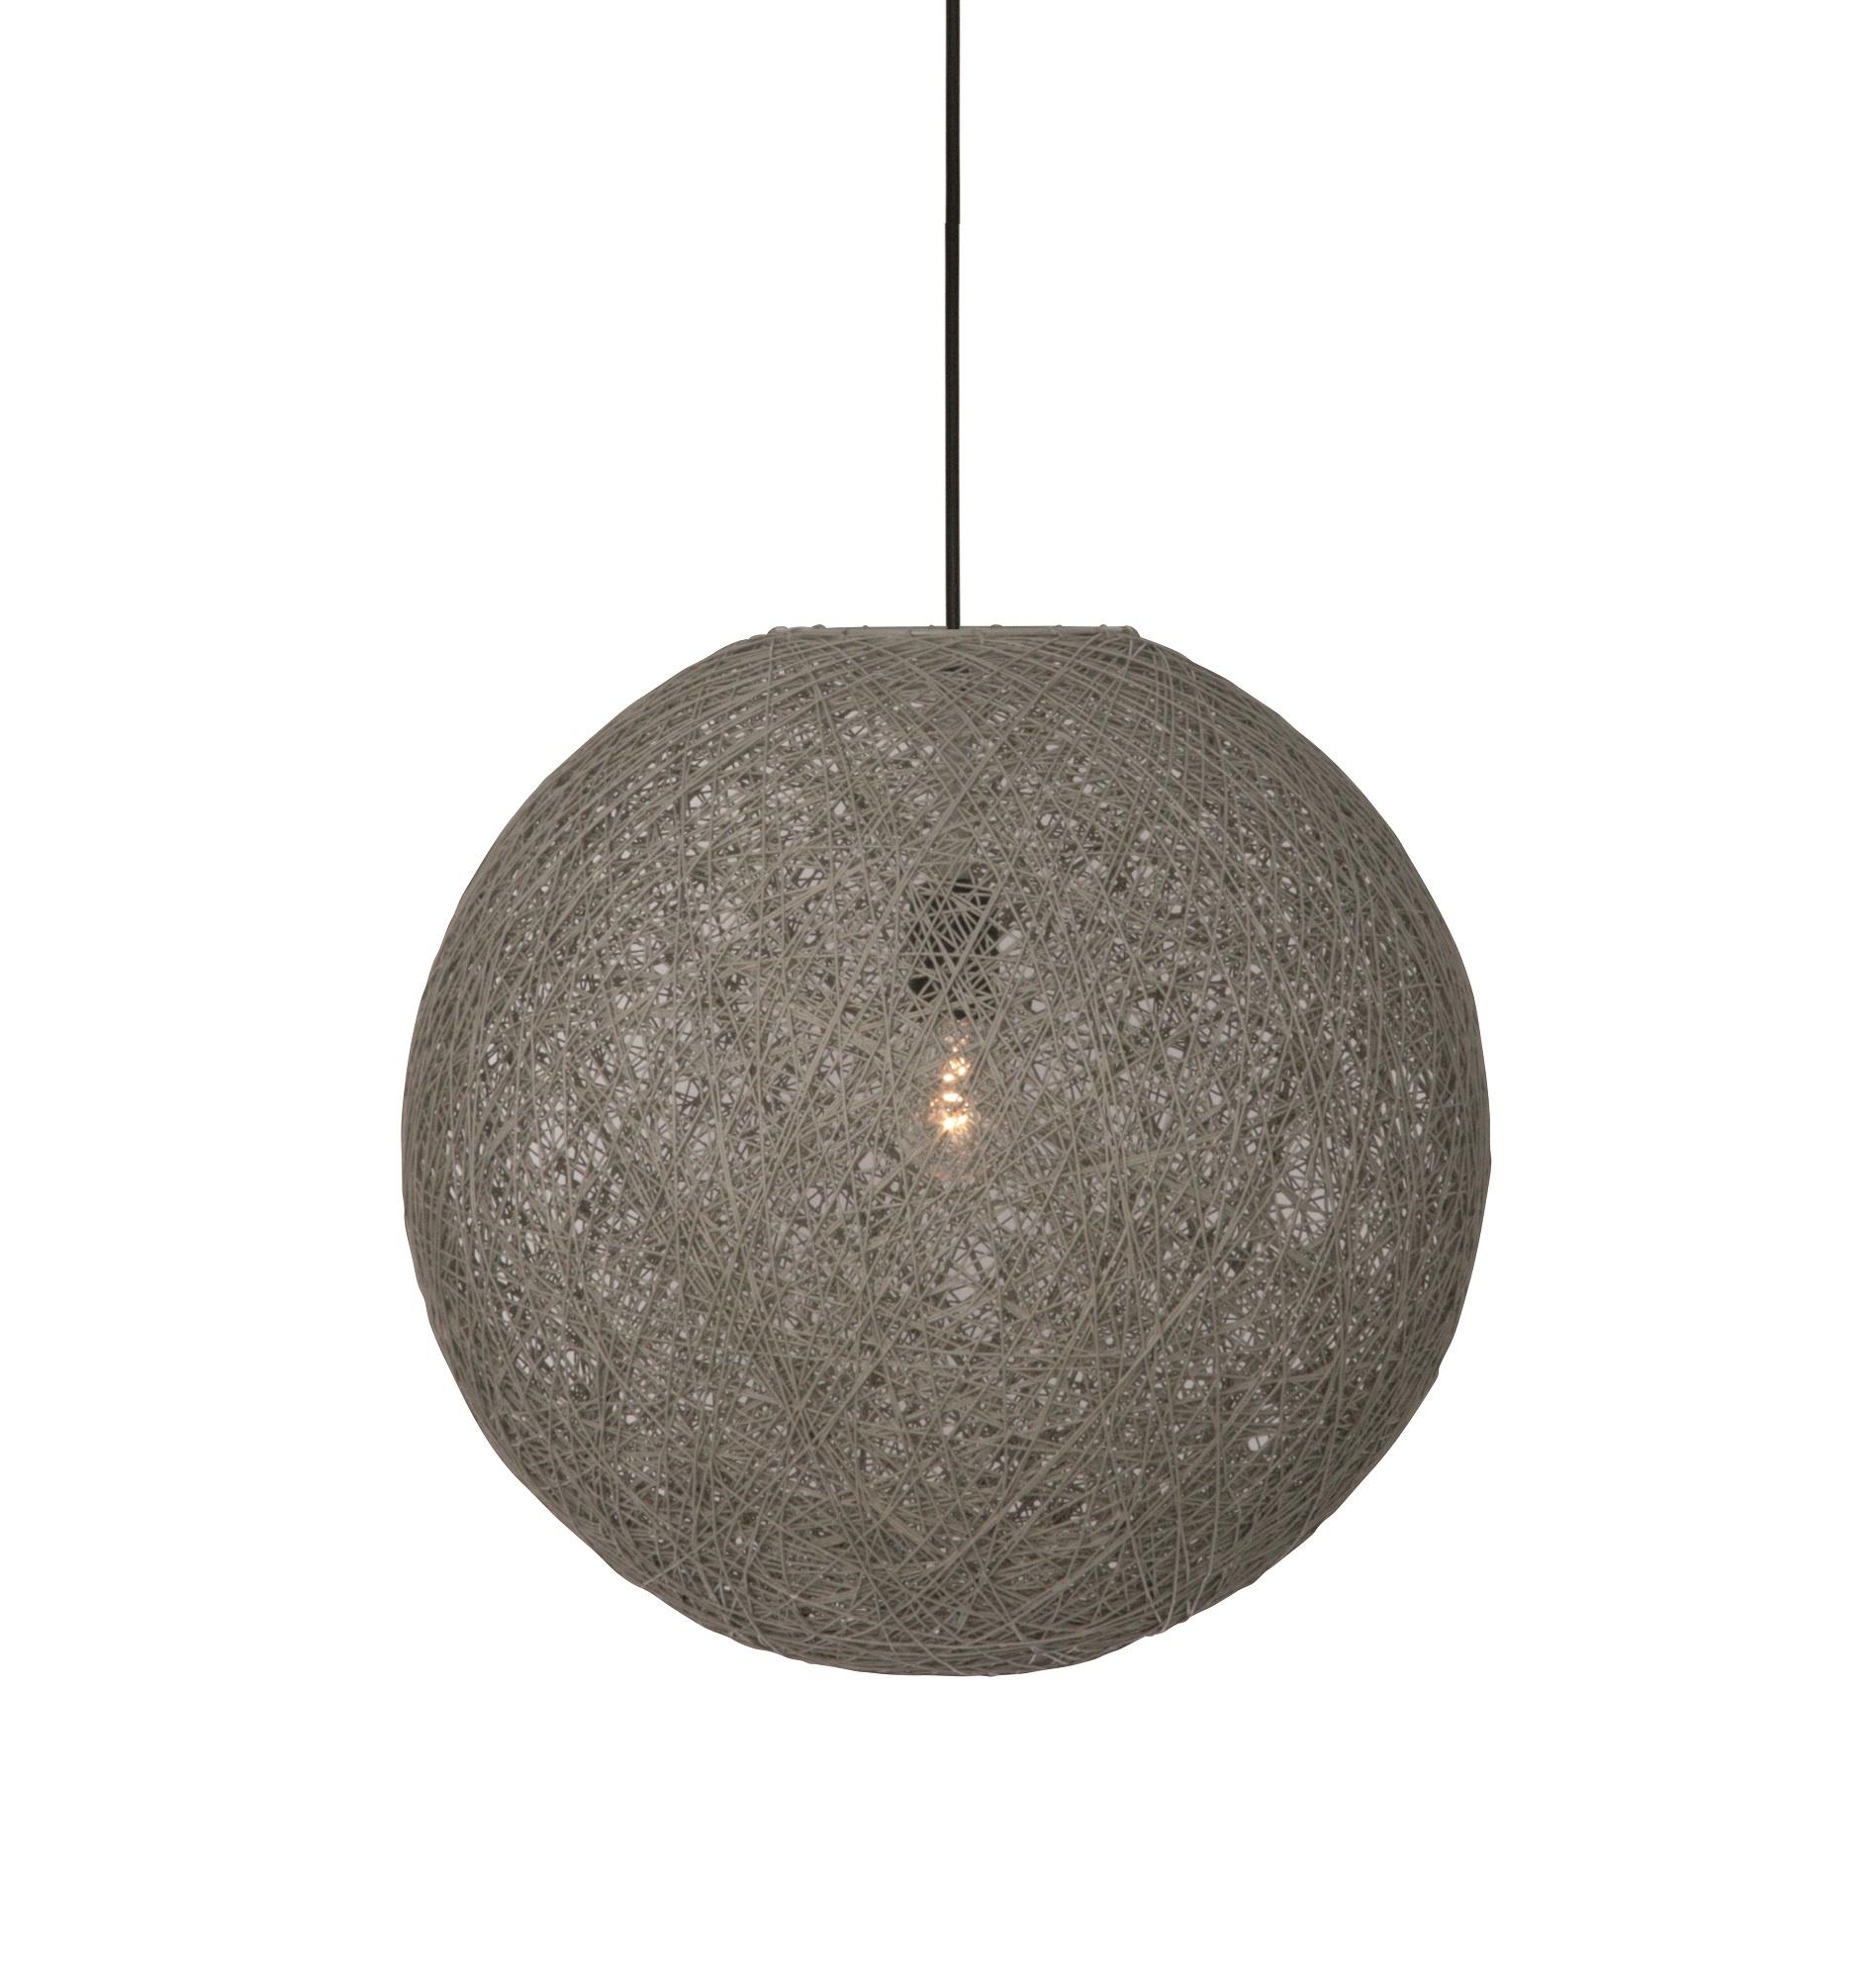 Hanglamp Twisted 60cm Beton Grijs |  | 8718444956815